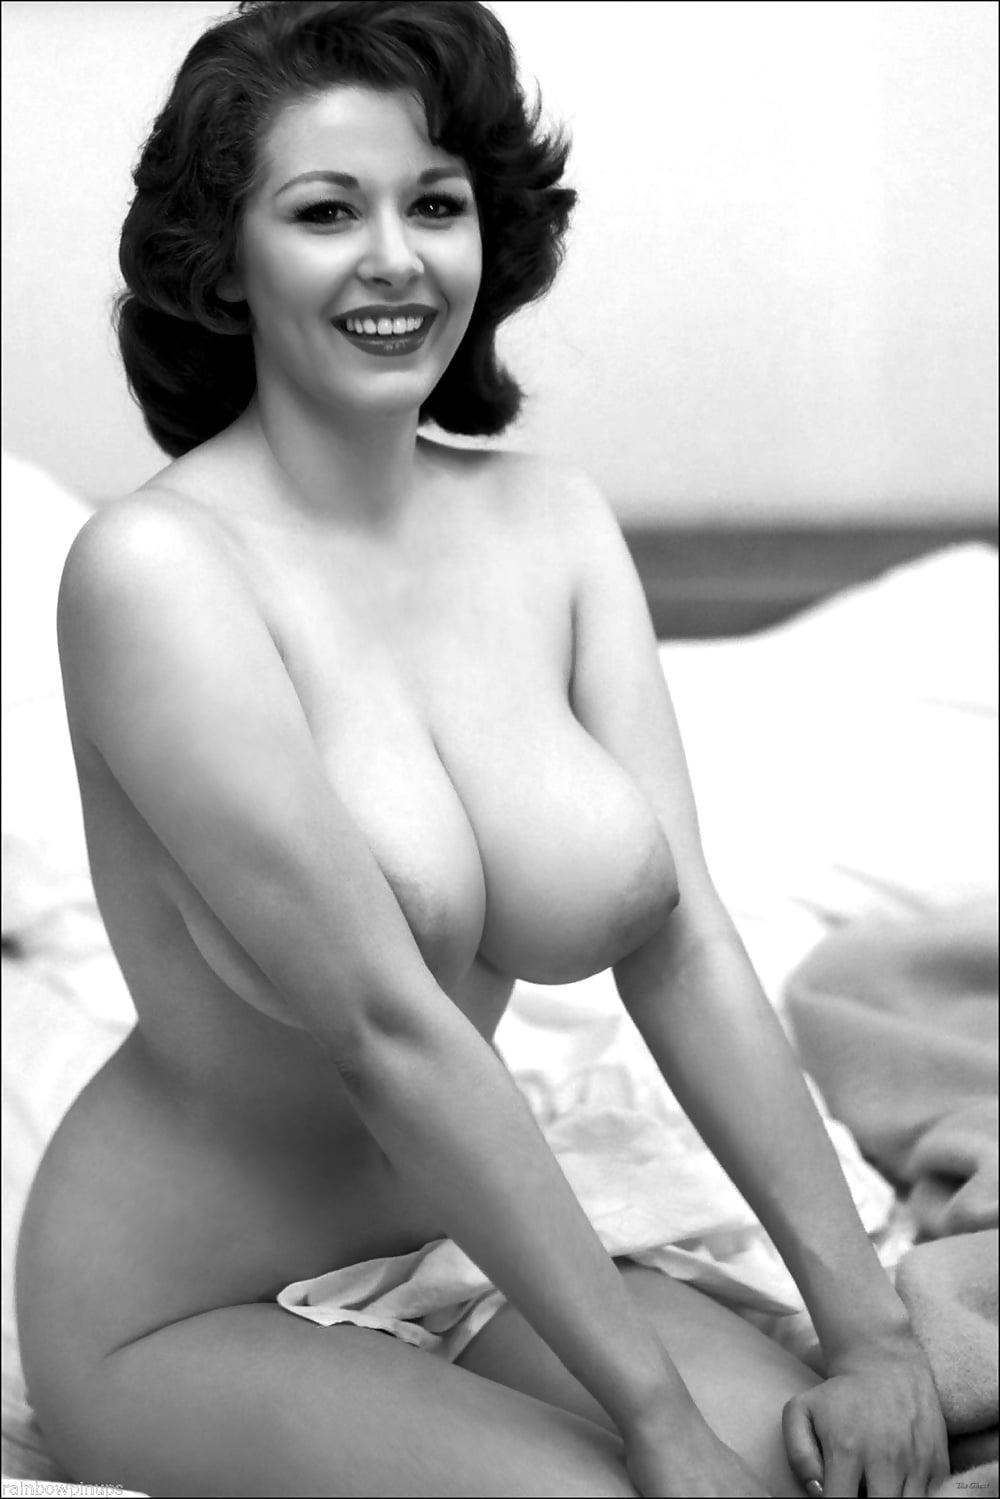 galleries-nude-cordelia-reynolds-nude